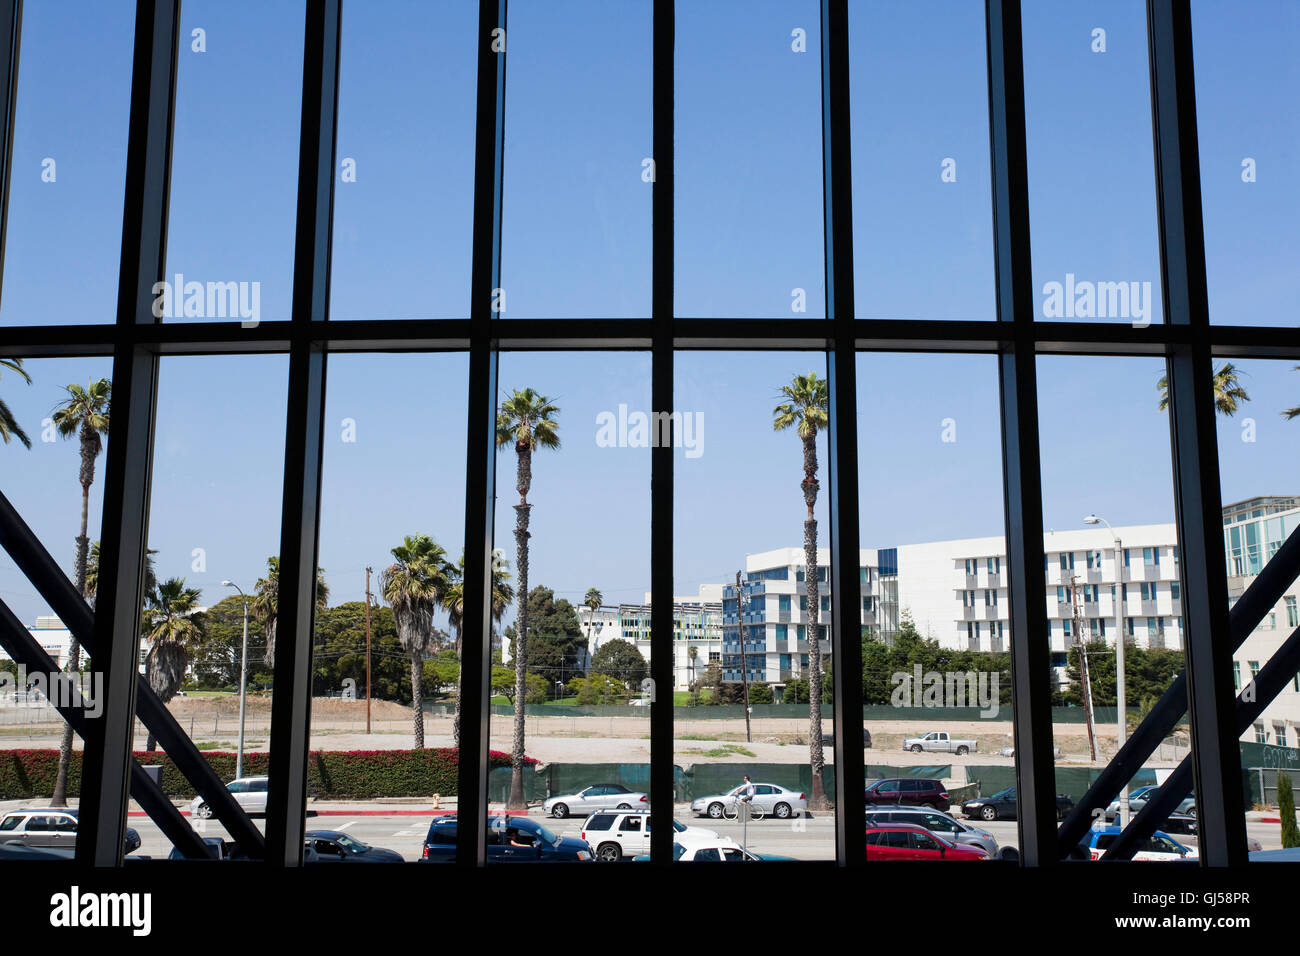 Los Angeles - Stock Image